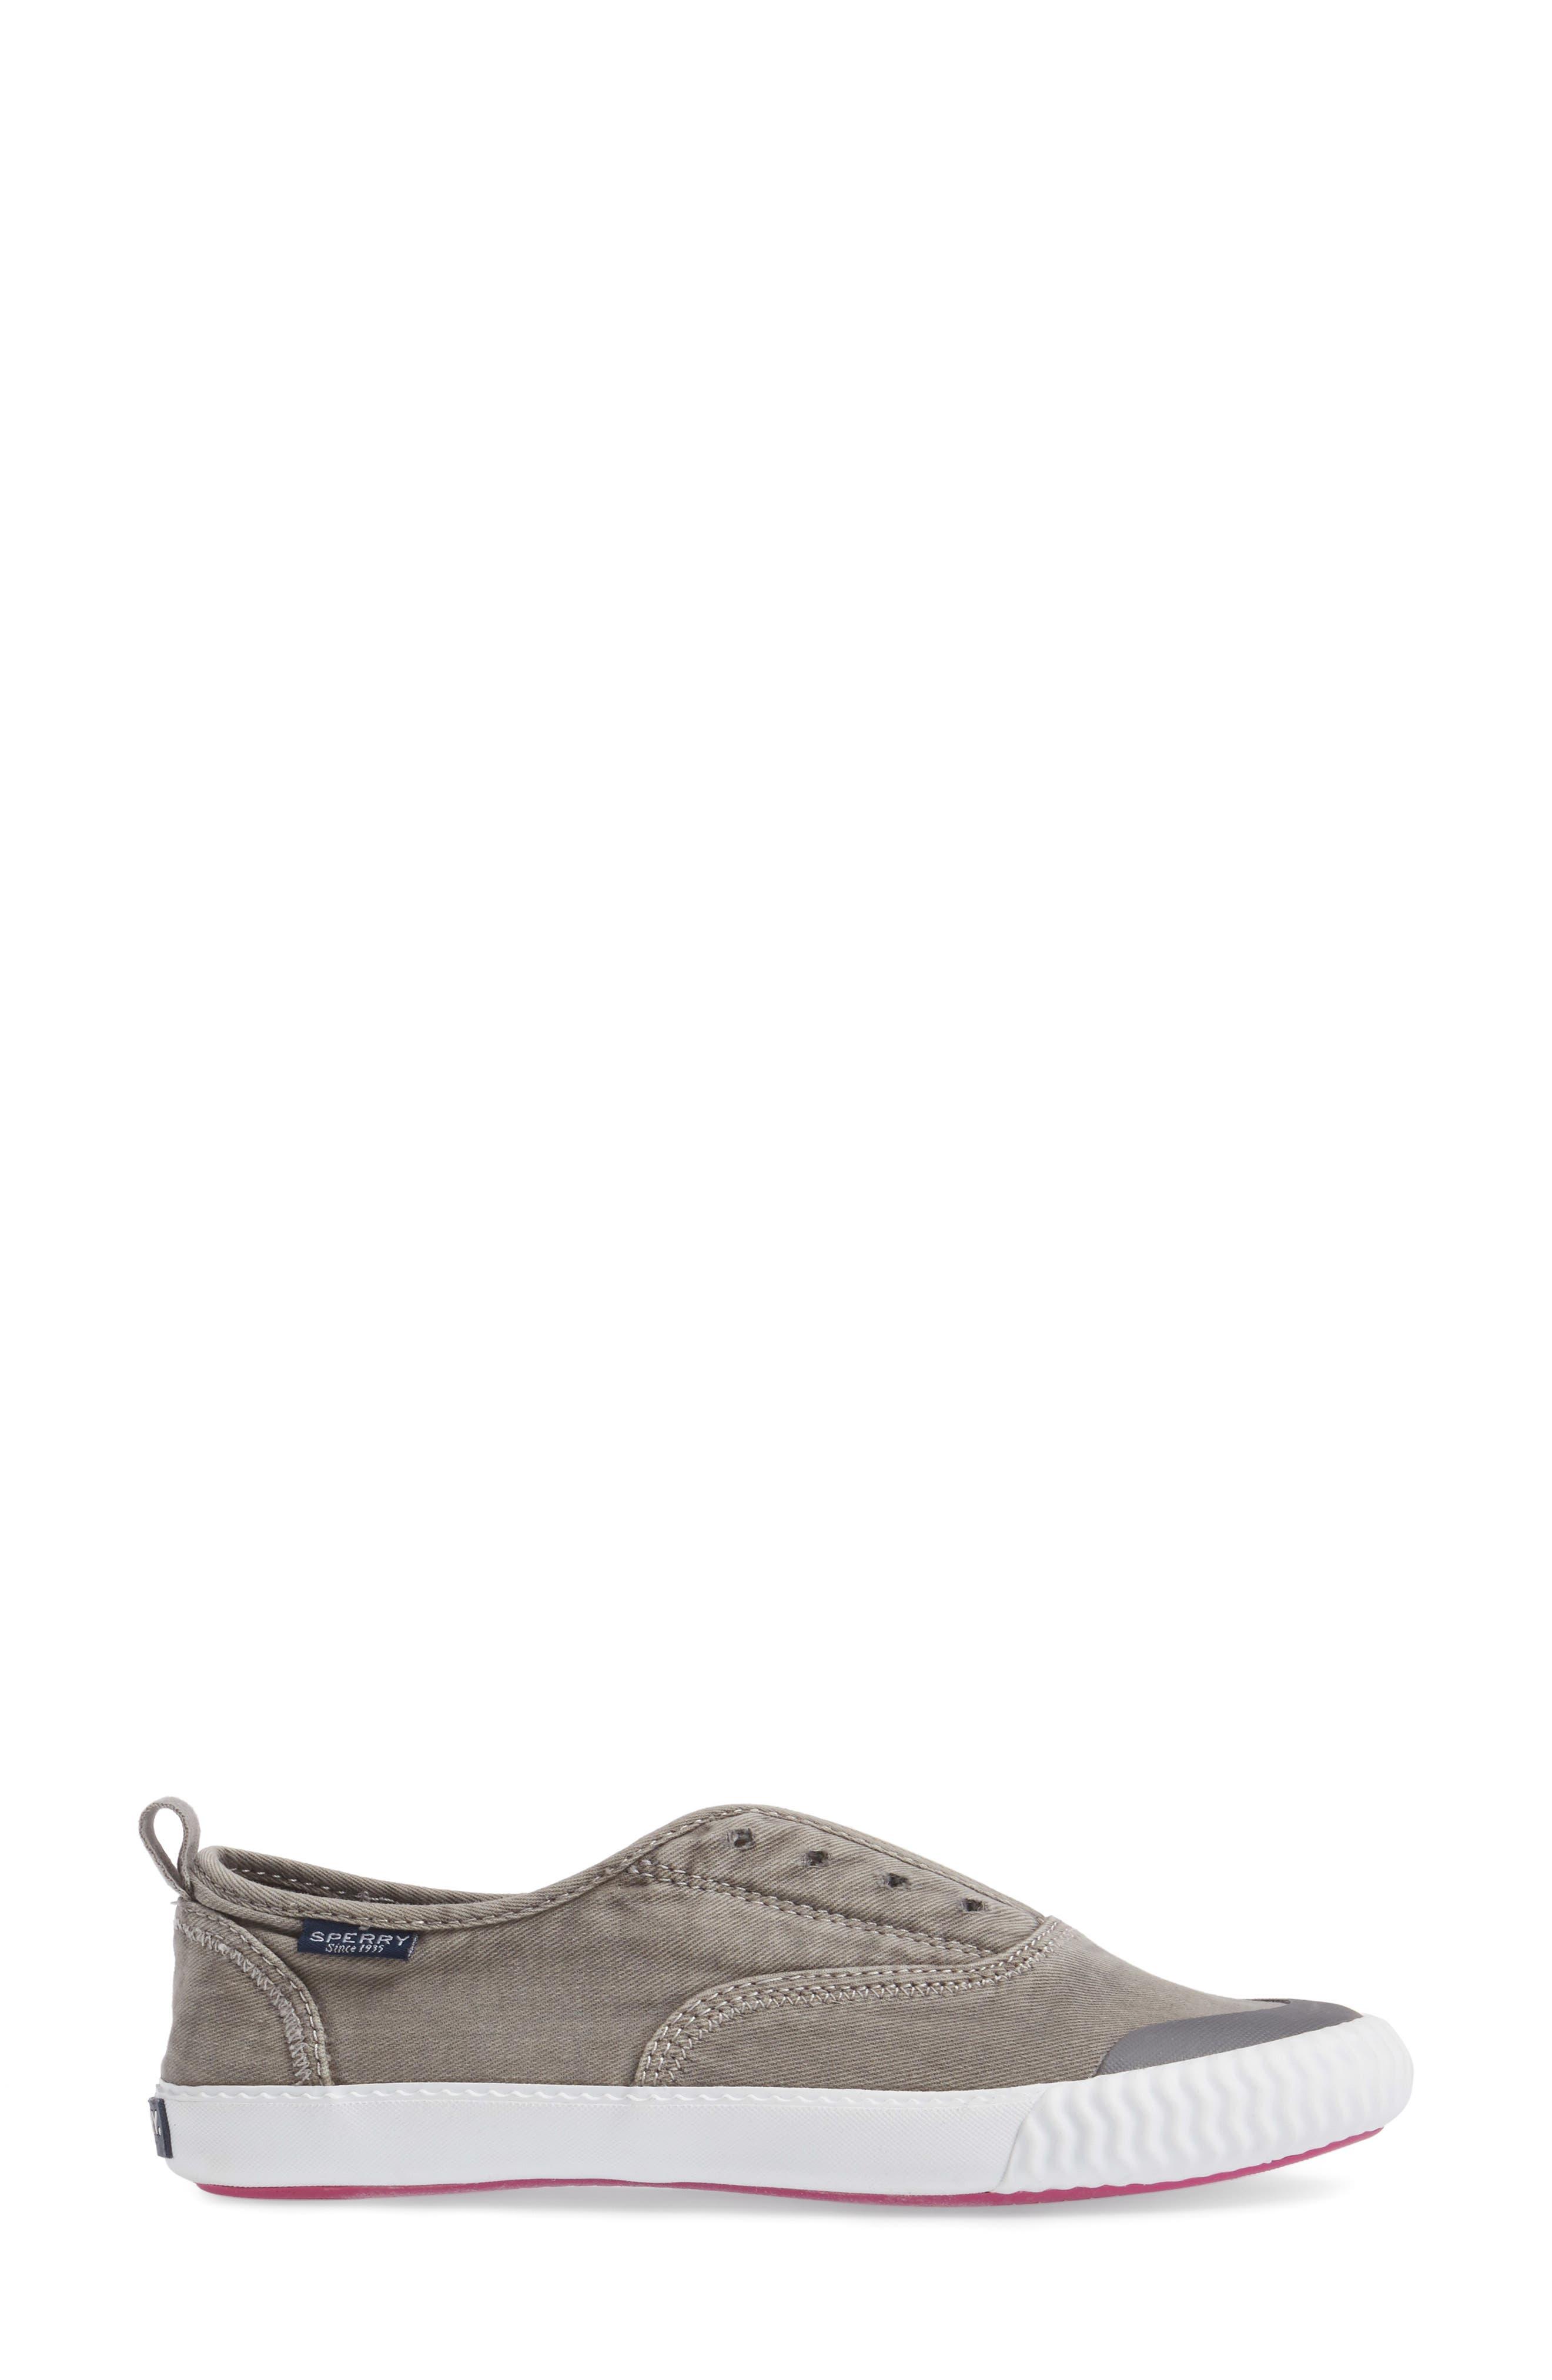 Sayel Slip-On Sneaker,                             Alternate thumbnail 3, color,                             GREY FABRIC